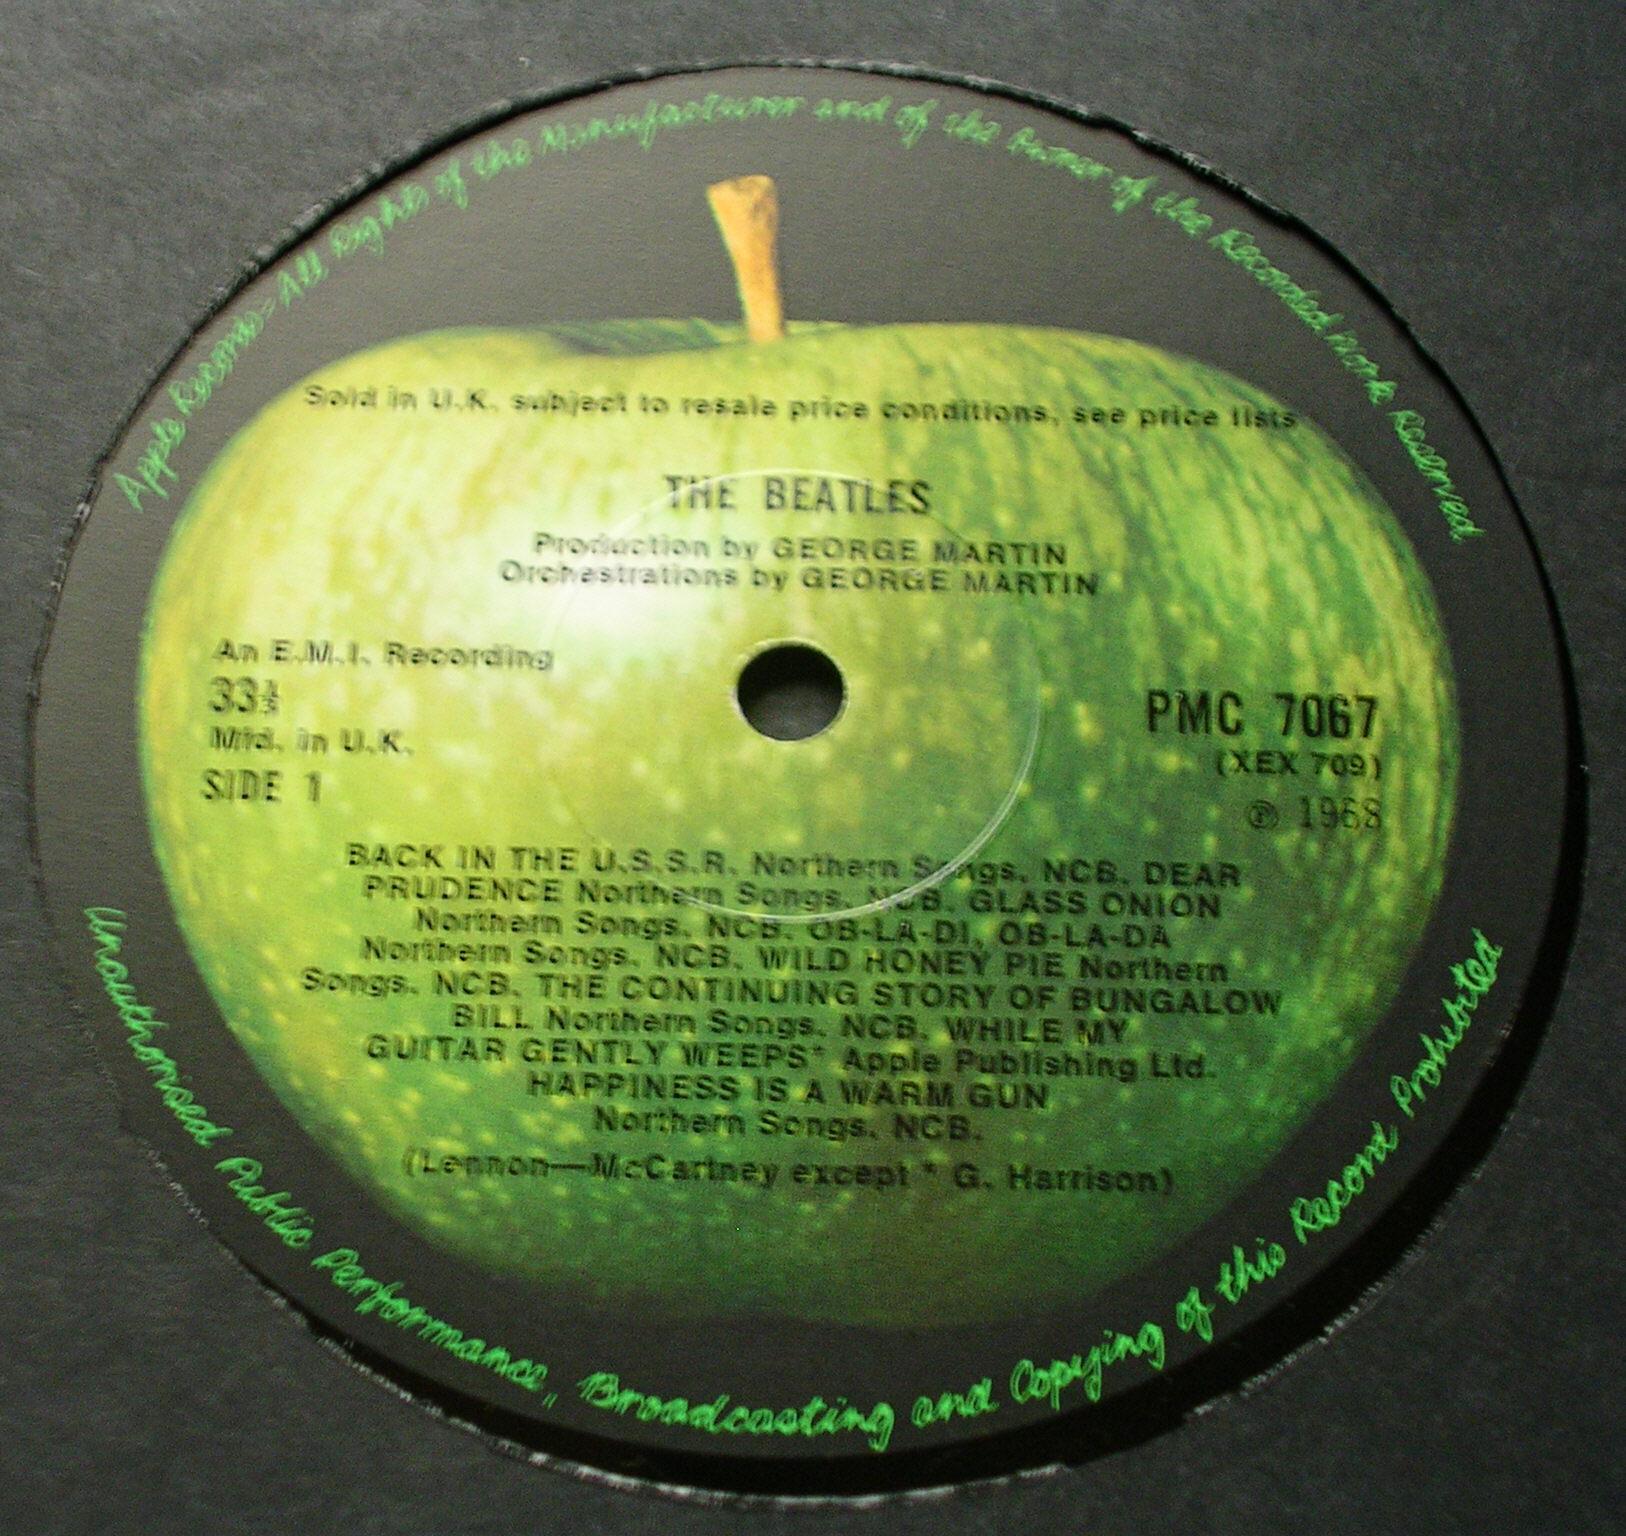 Image result for beatles vinyl album images